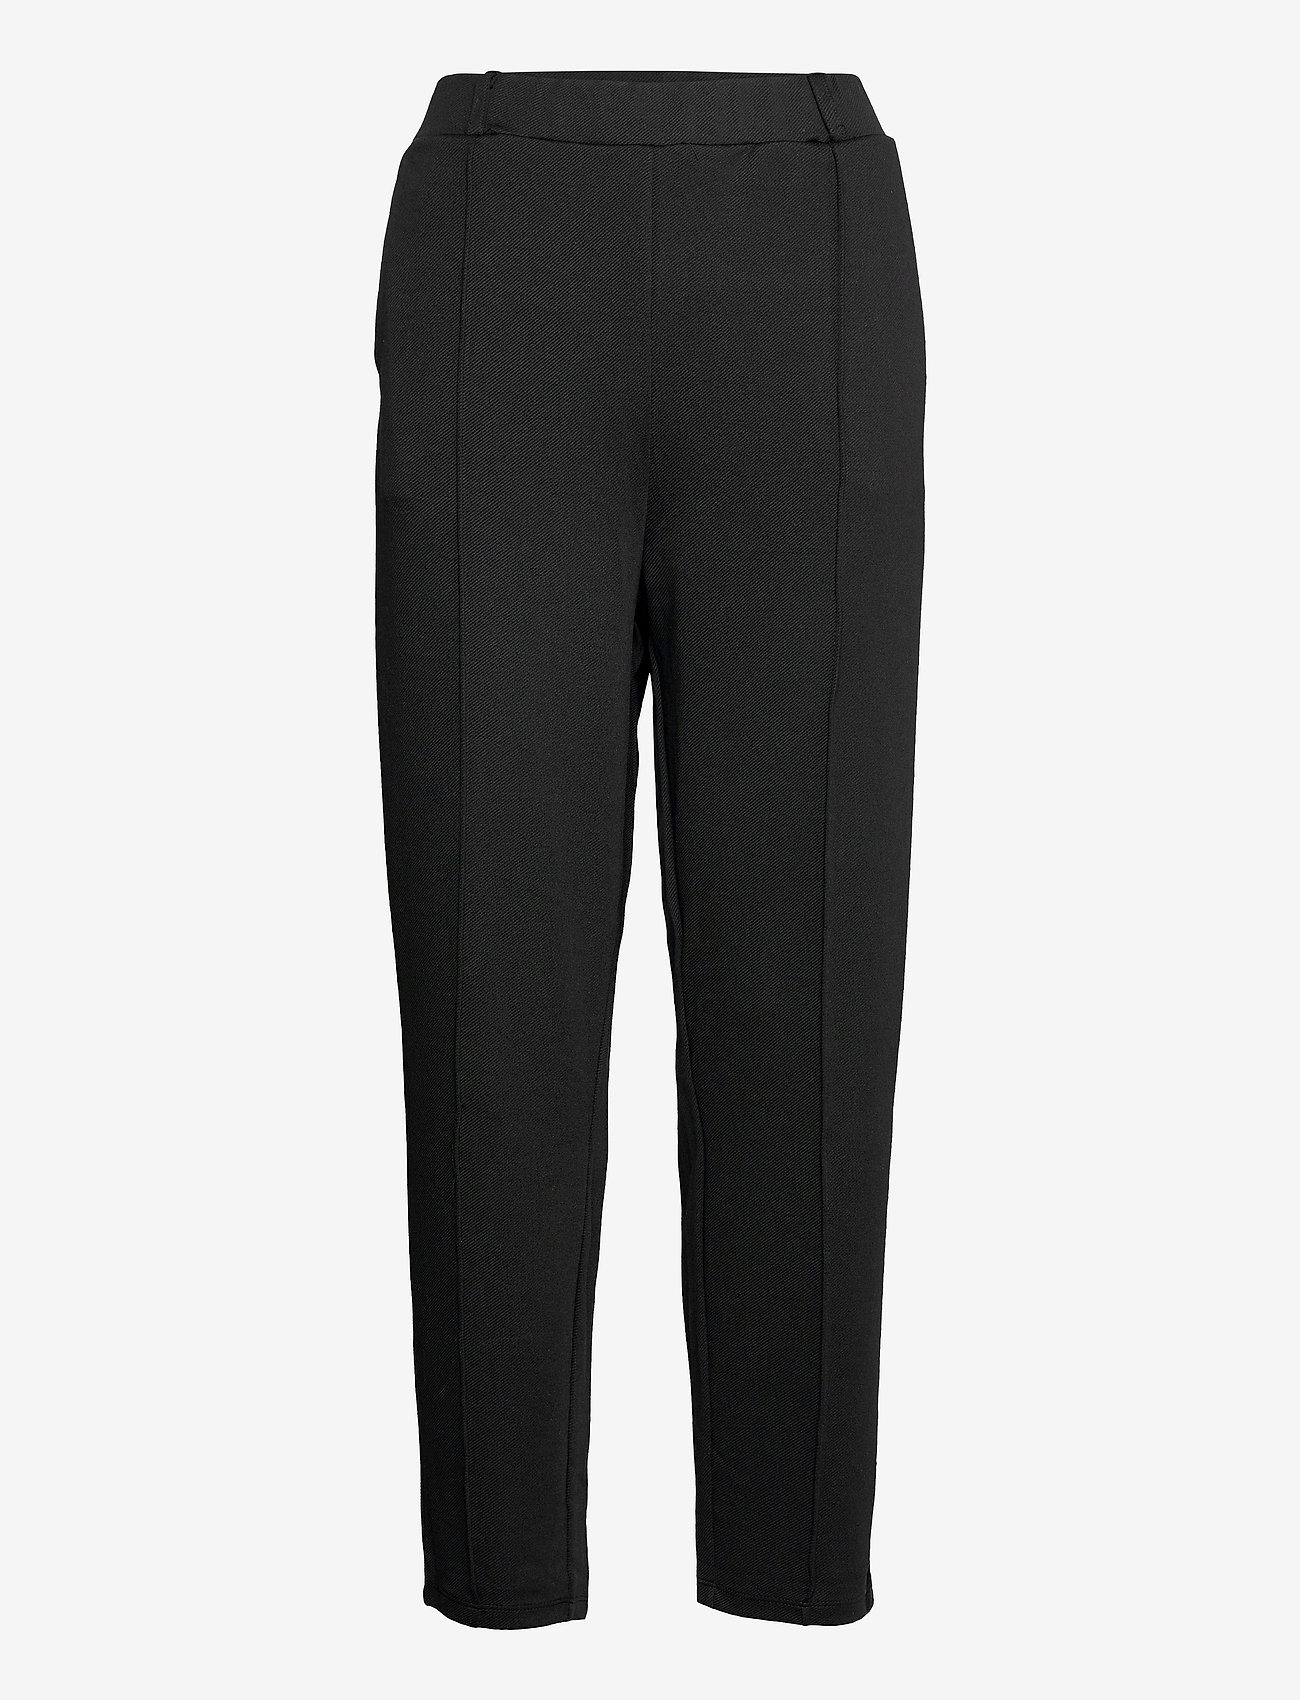 Lindex - Trousers Karin twill - pantalons droits - black - 0